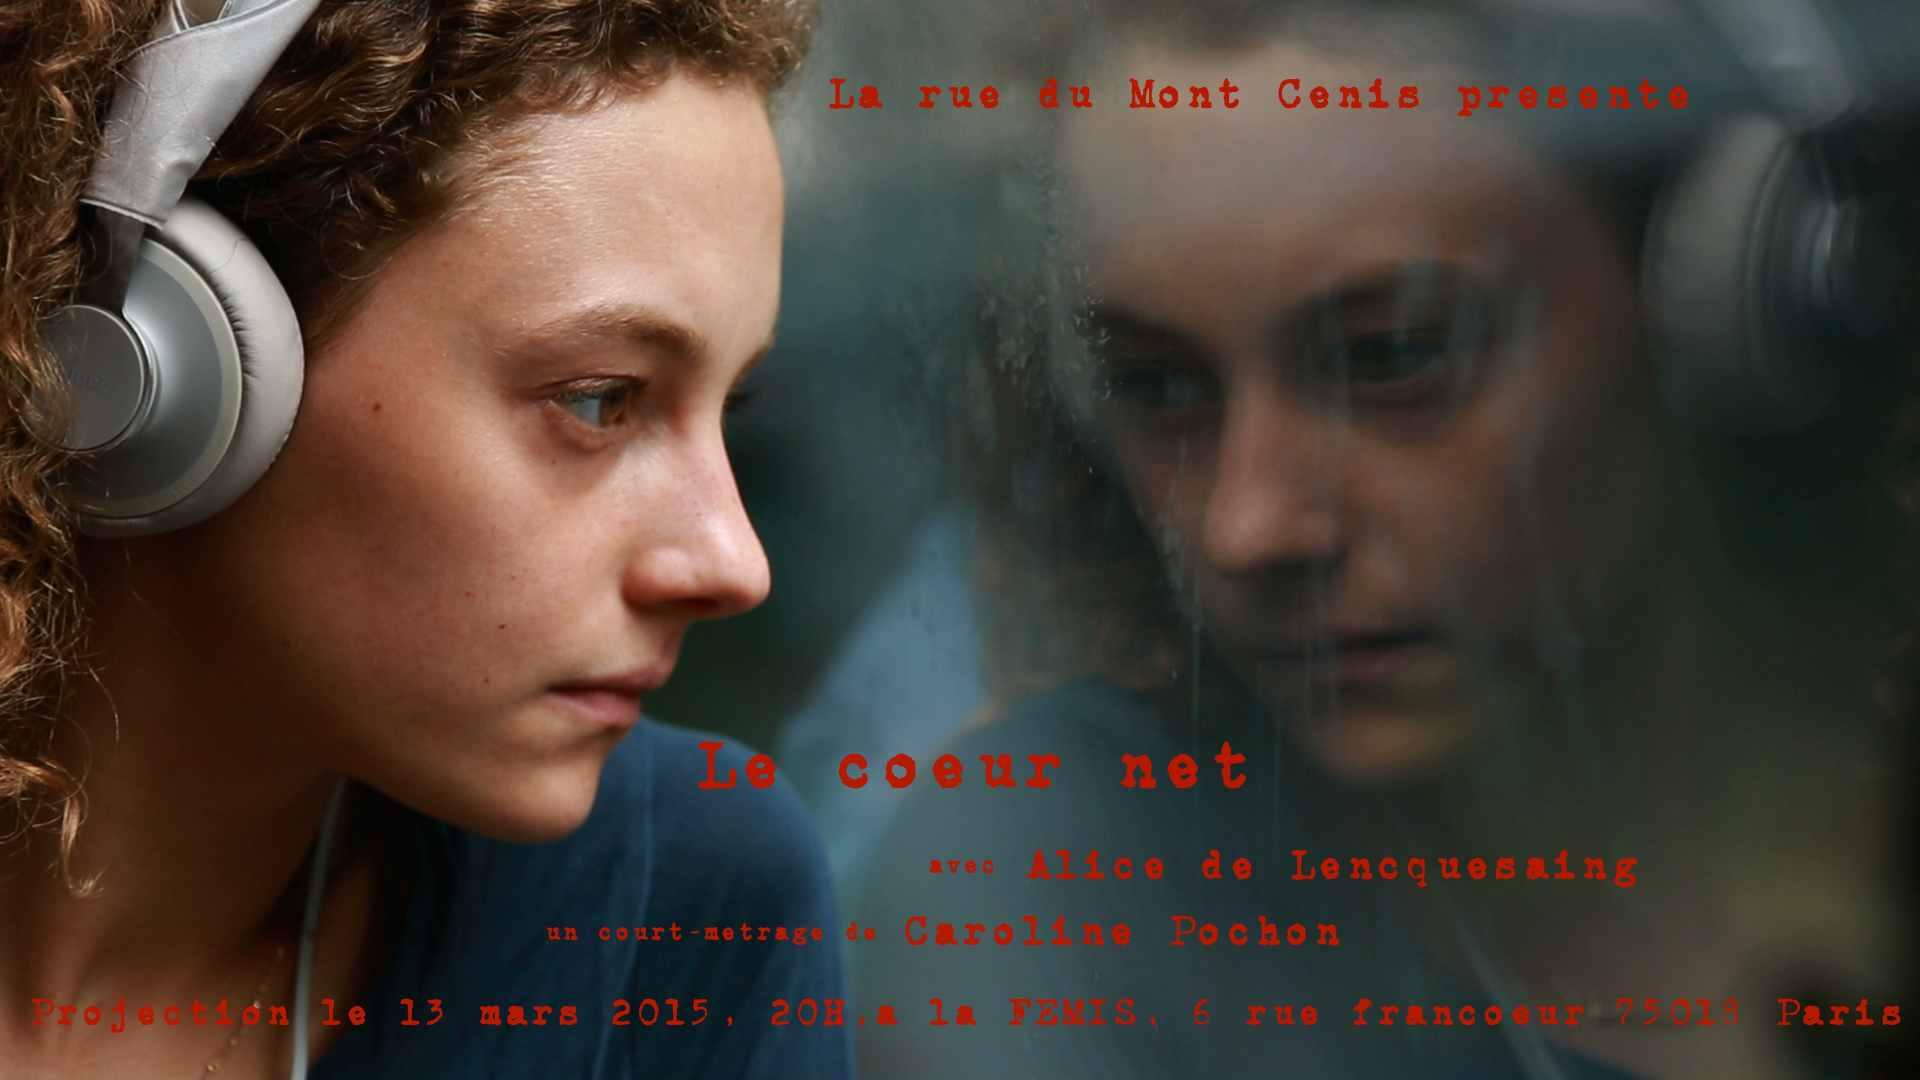 invitation projection Le coeur net, 13 mars 2015